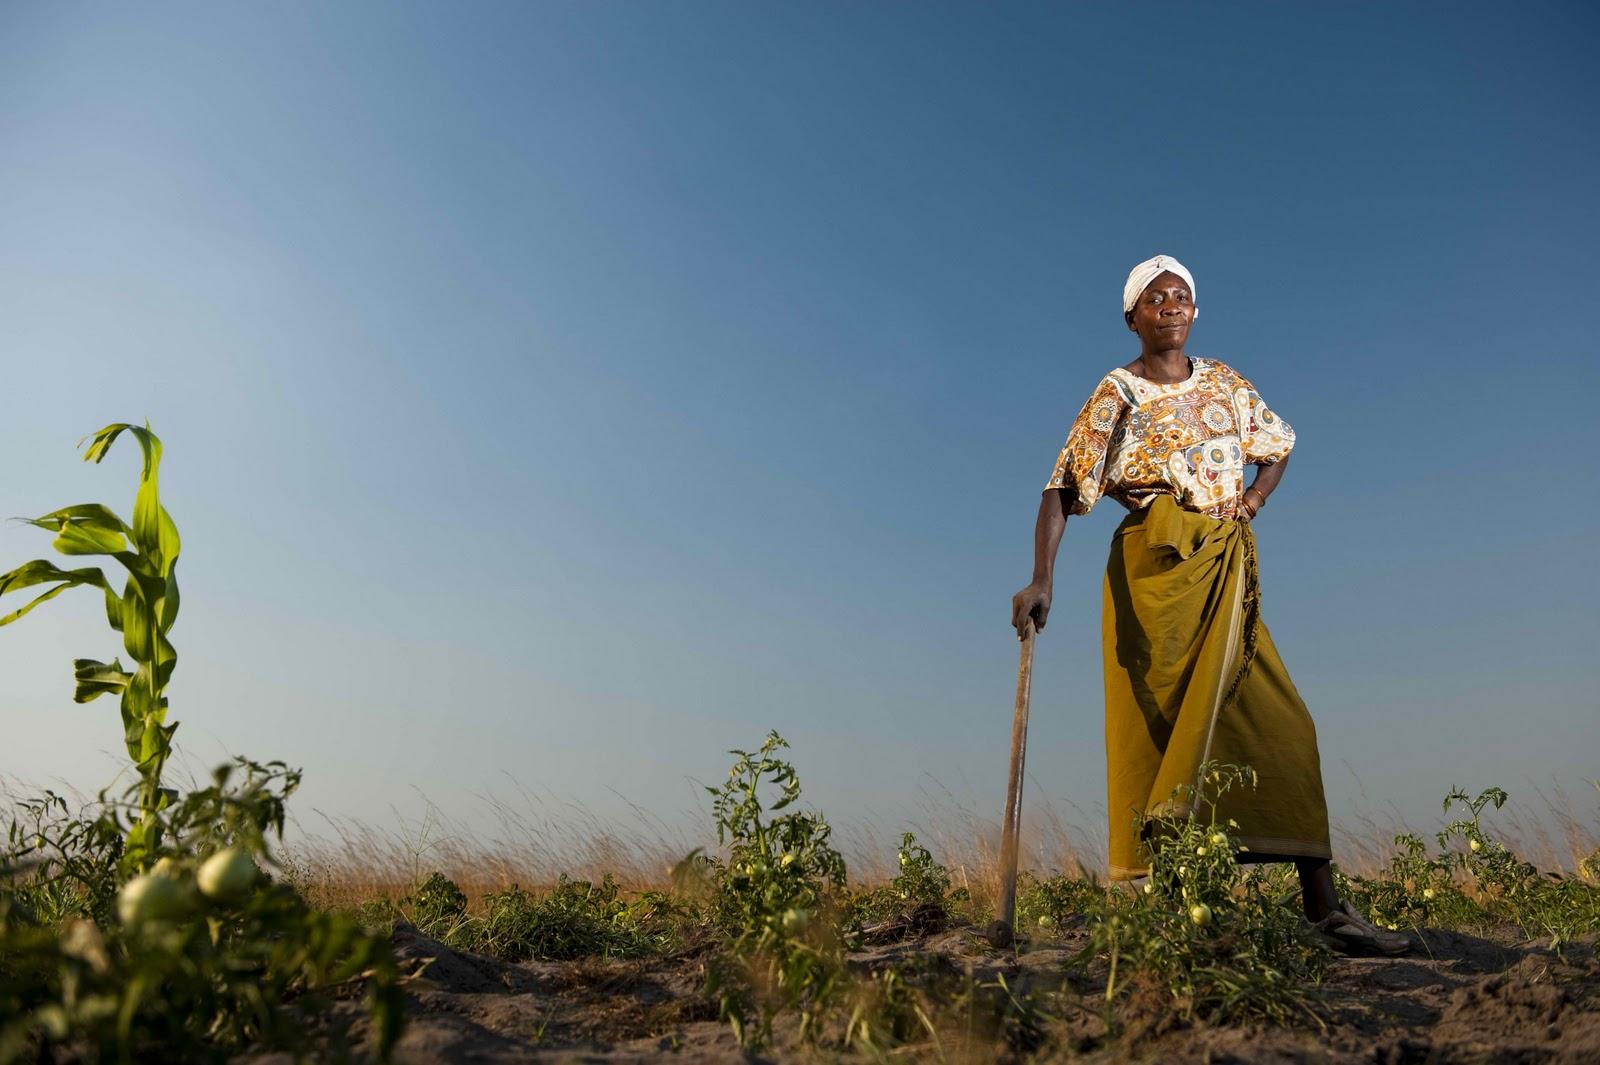 An African woman farmer (PHOTO: africaag.org)